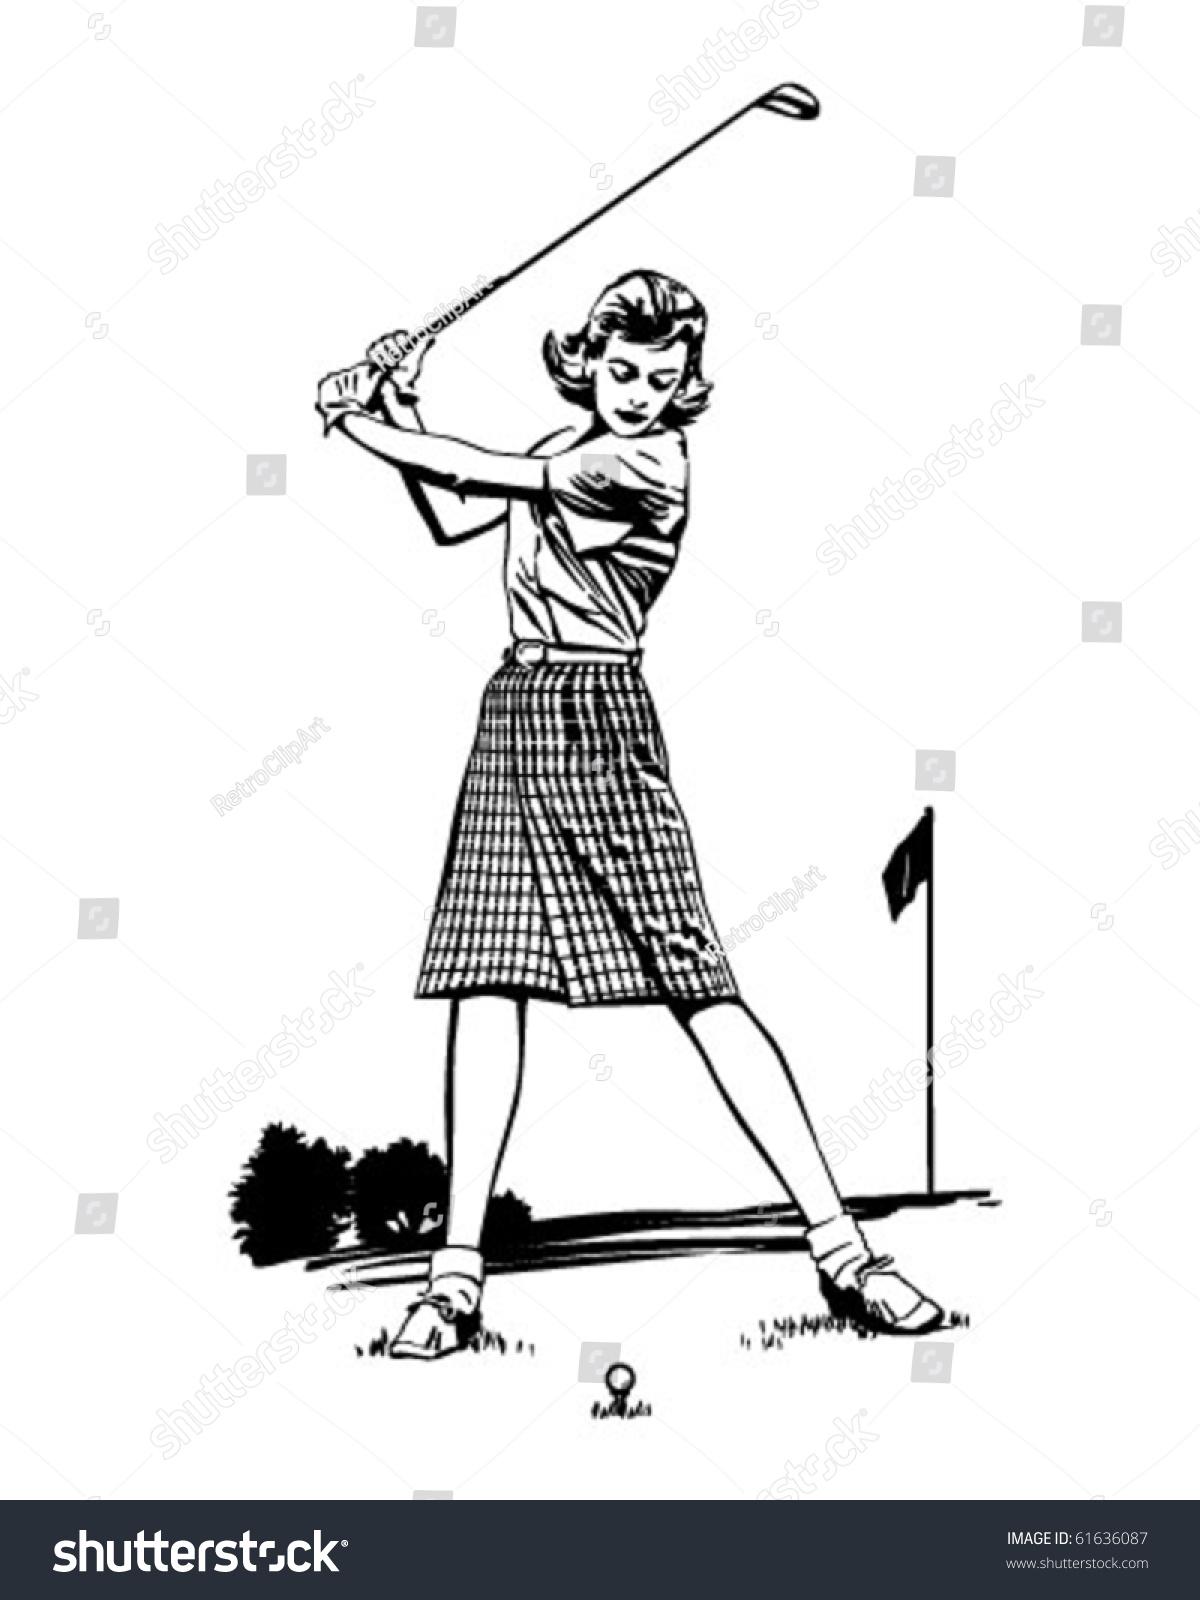 free vintage golf clip art - photo #41